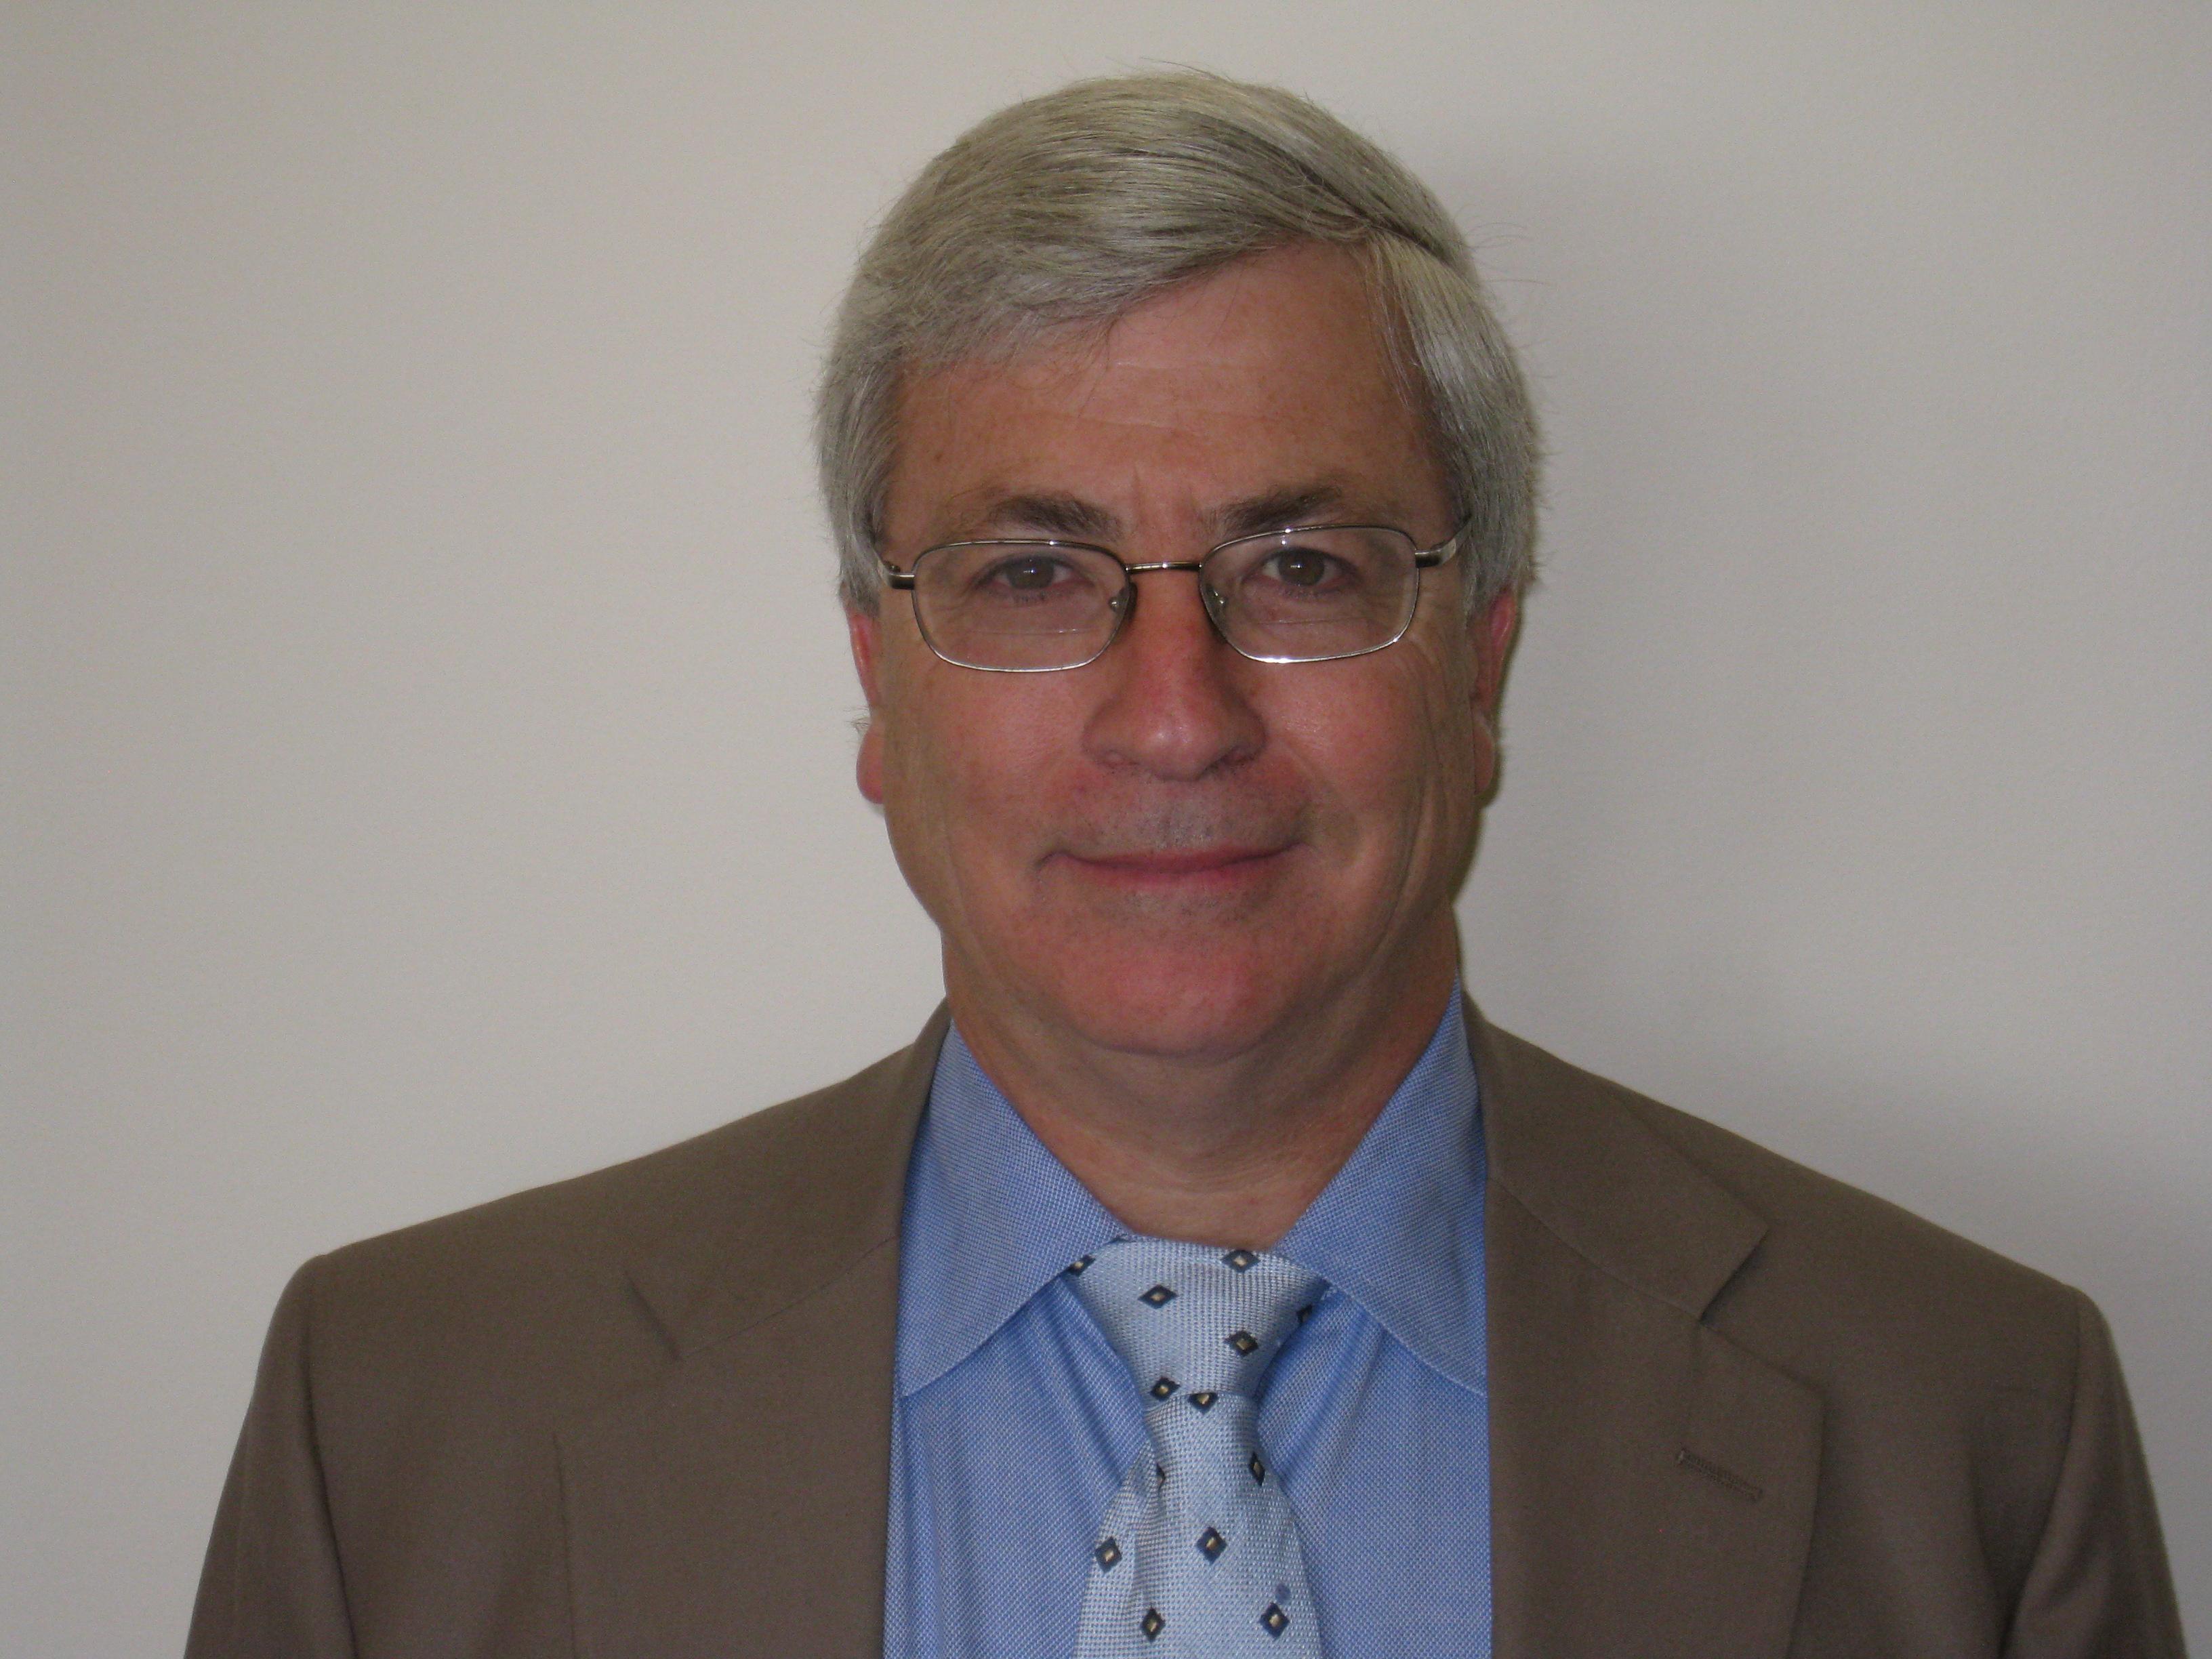 Paul Turer, MD